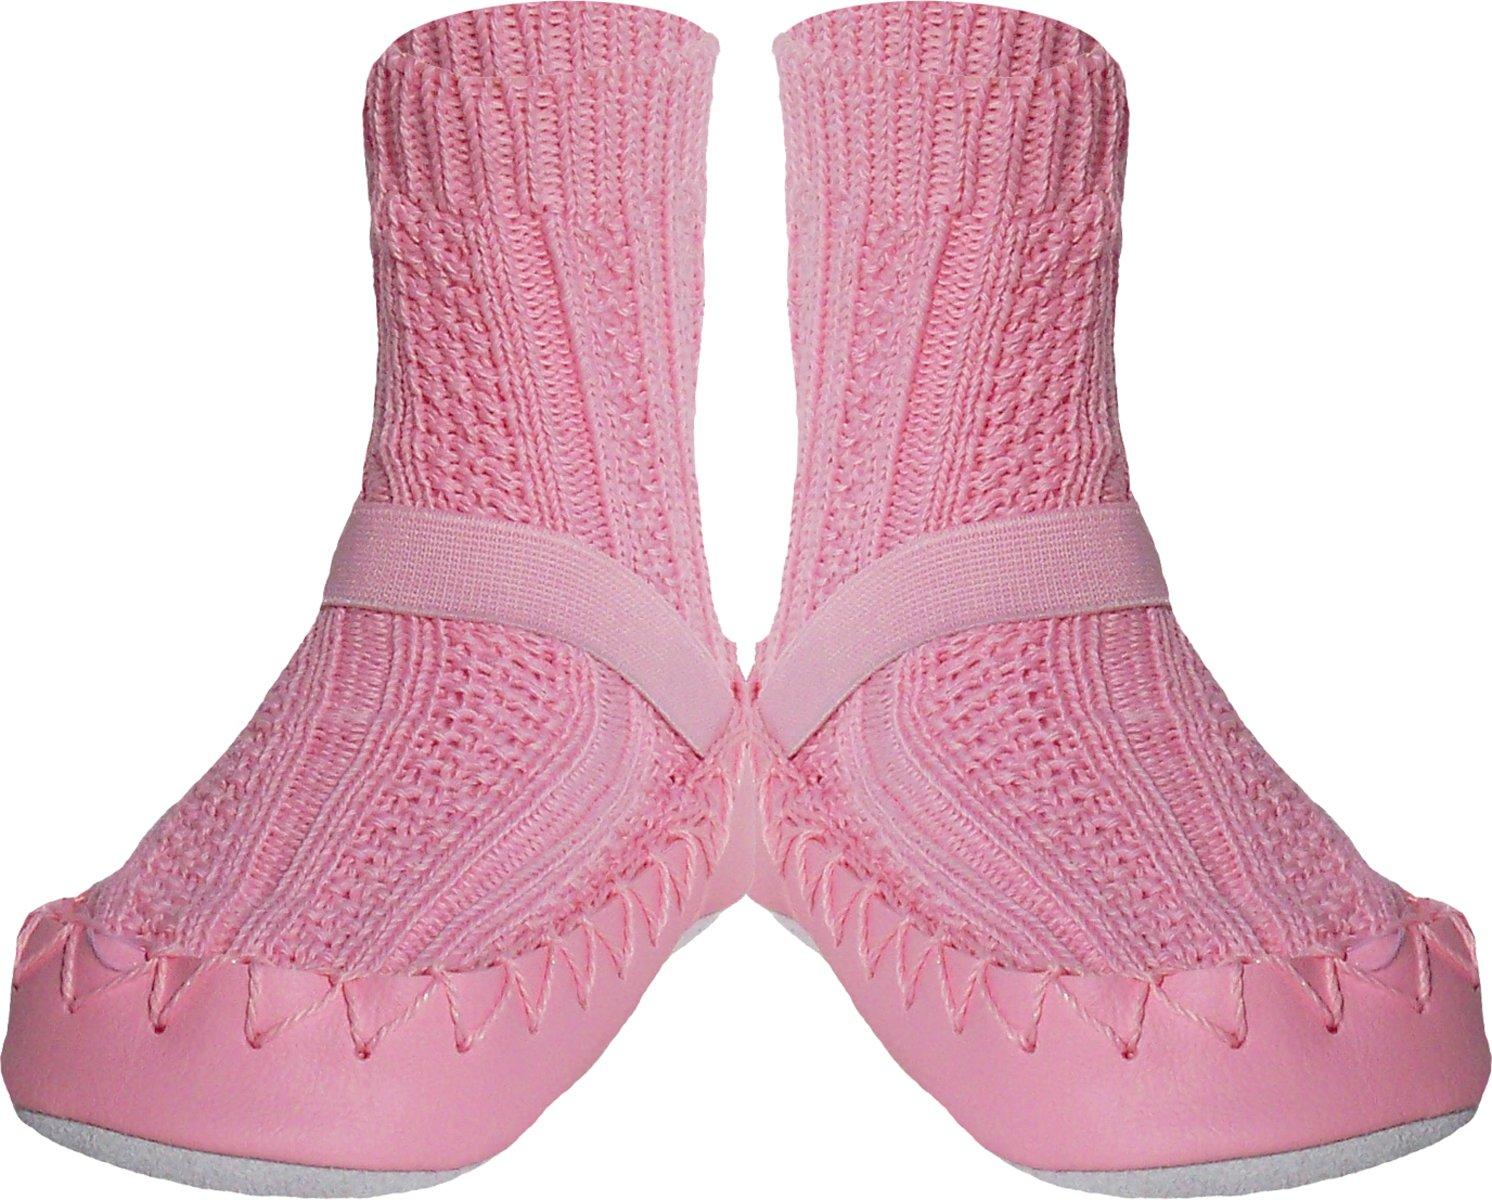 Konfetti Cable Knit Swedish Moccasin Slipper Socks by Konfetti (Image #1)